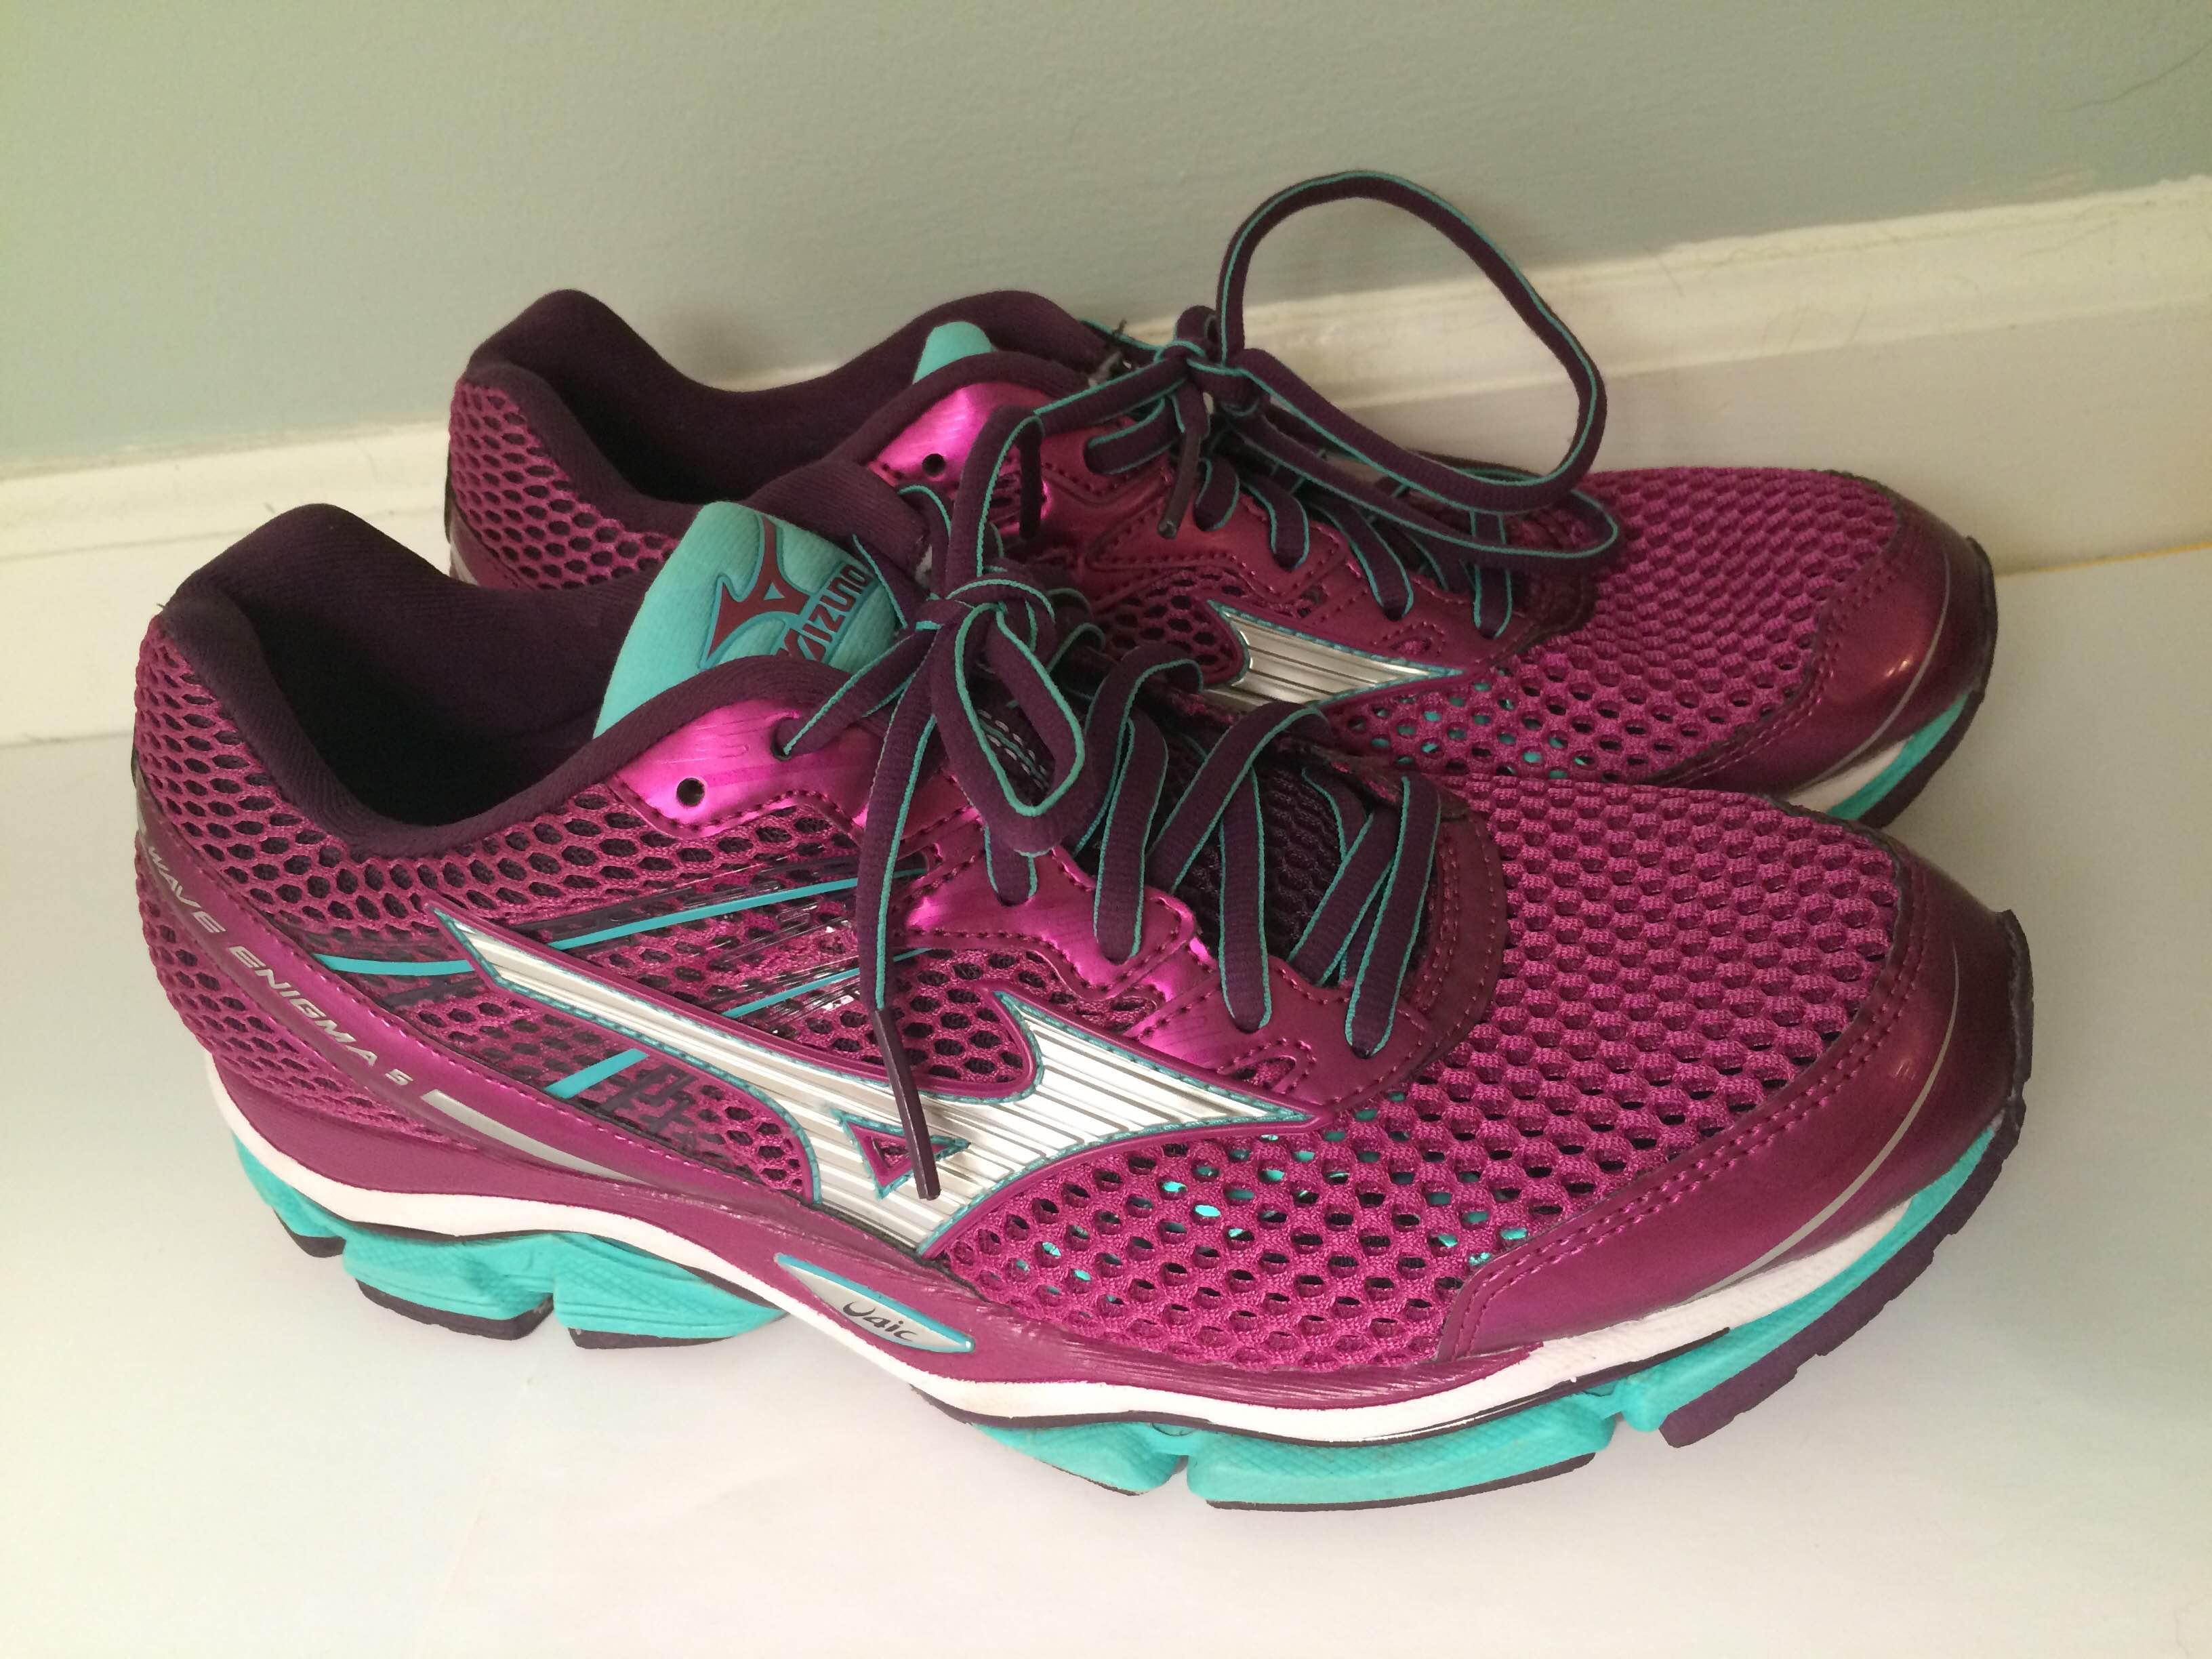 Do Mizuno Running Shoes Run Small